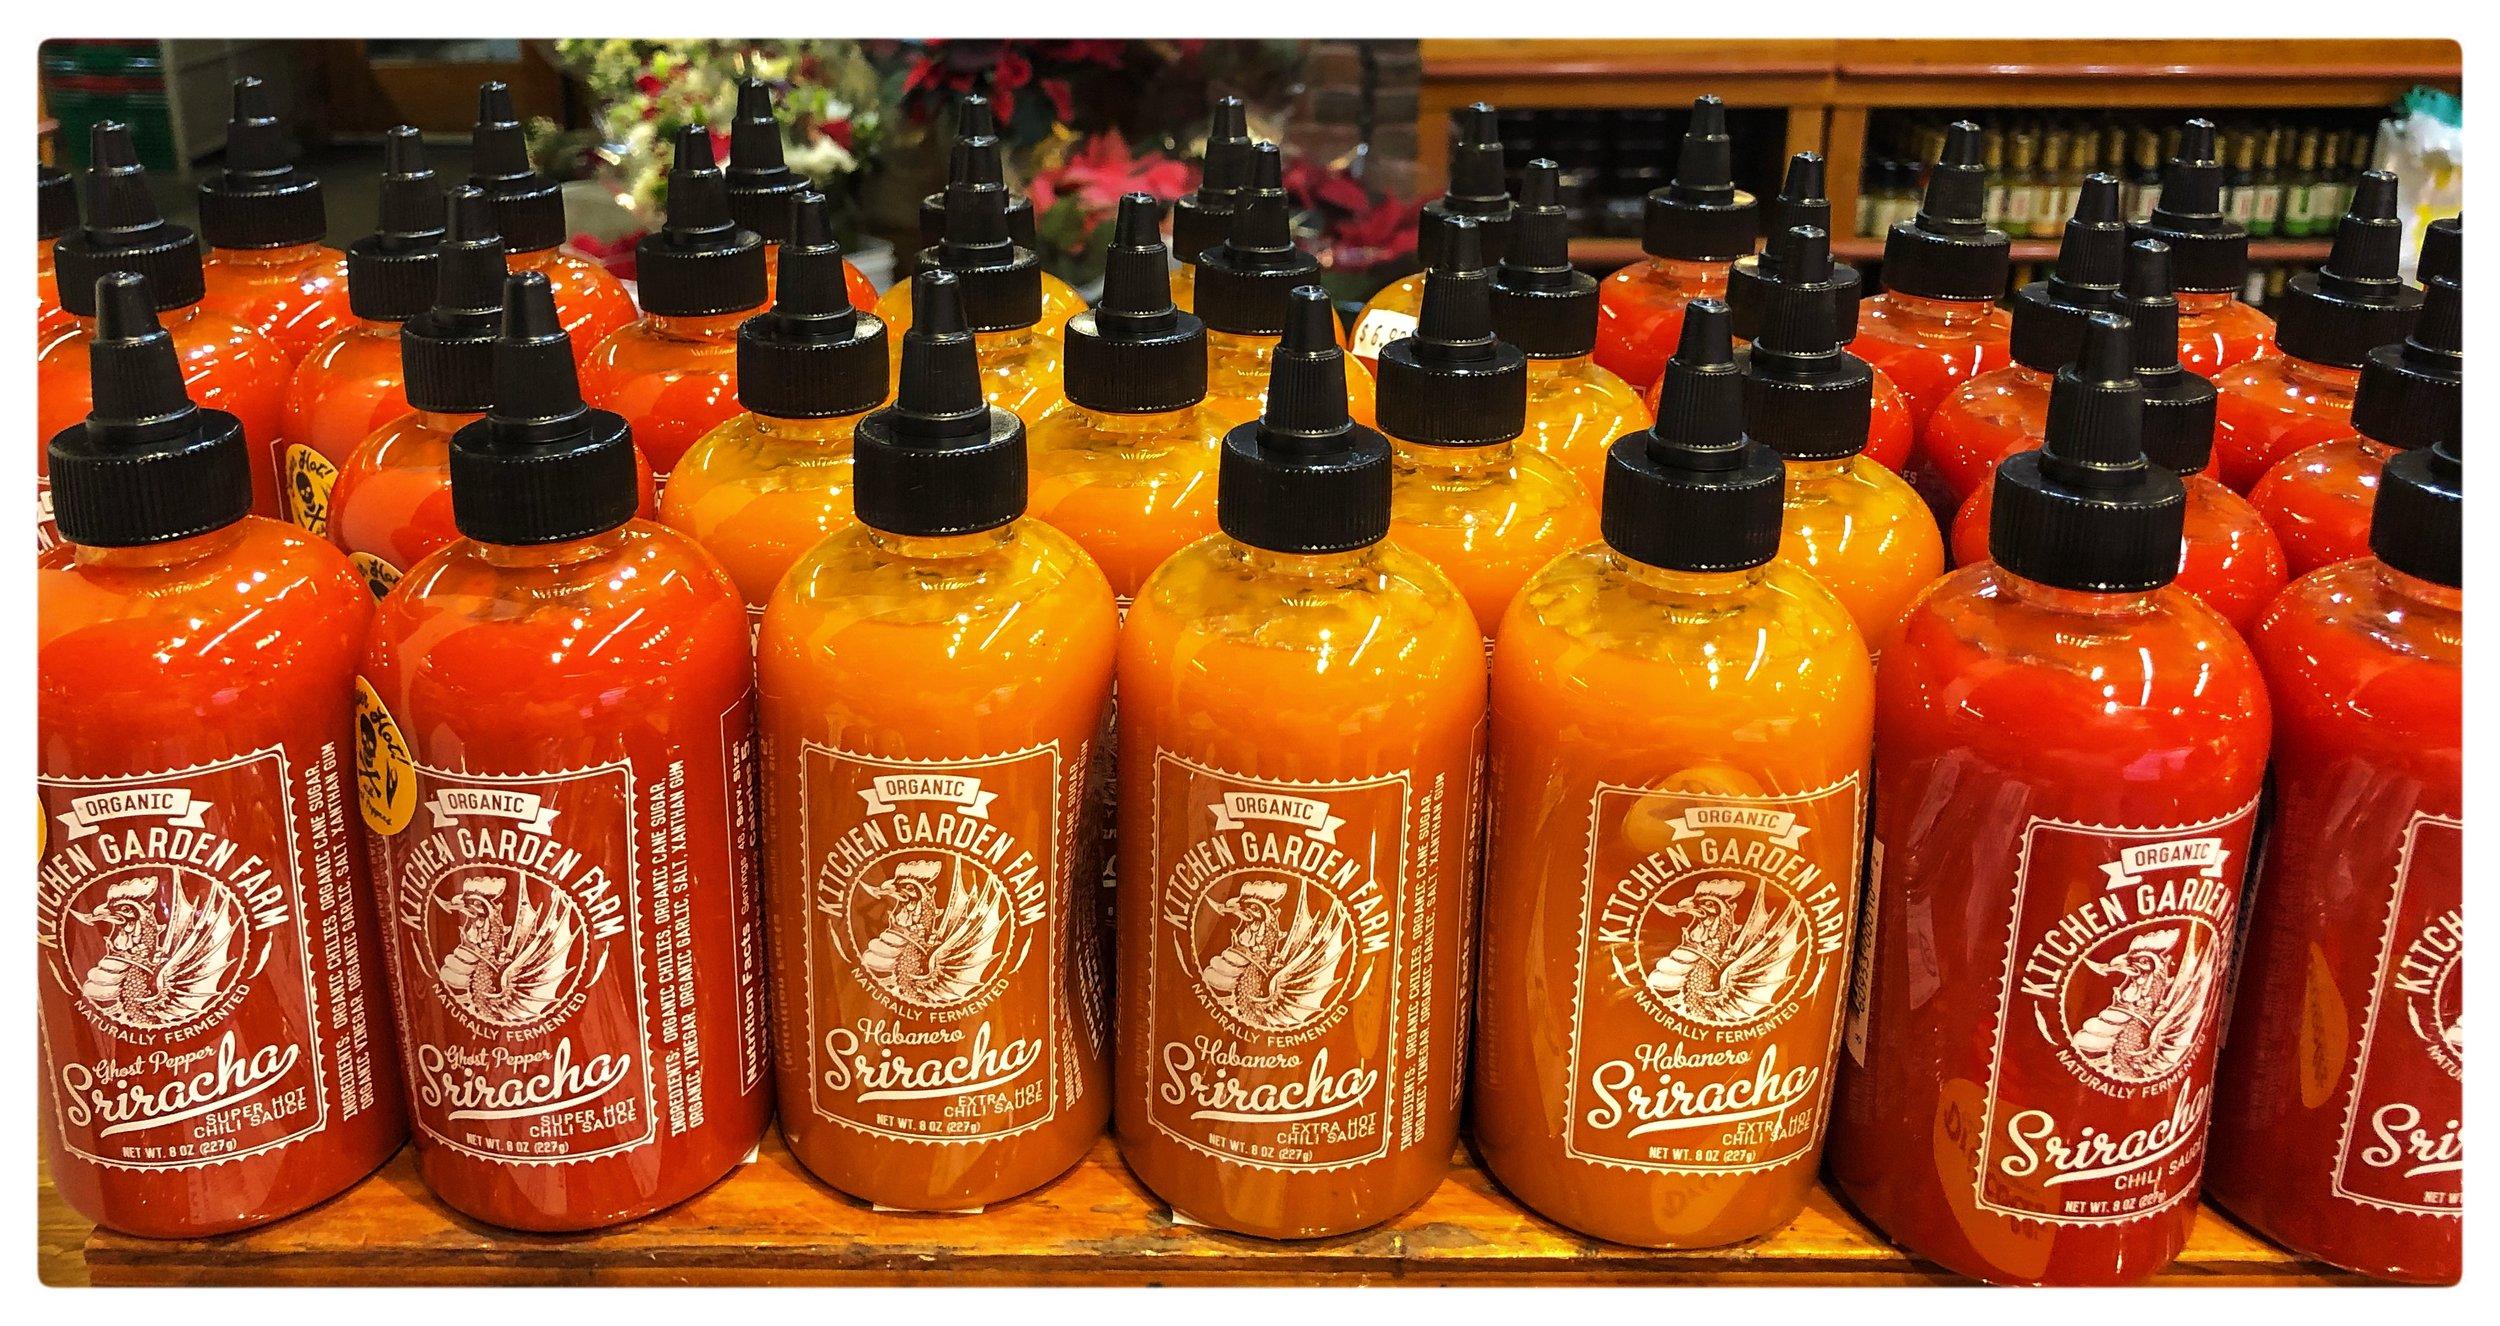 Massachusetts-made organic Sriracha makes a delicious stocking stuffer!